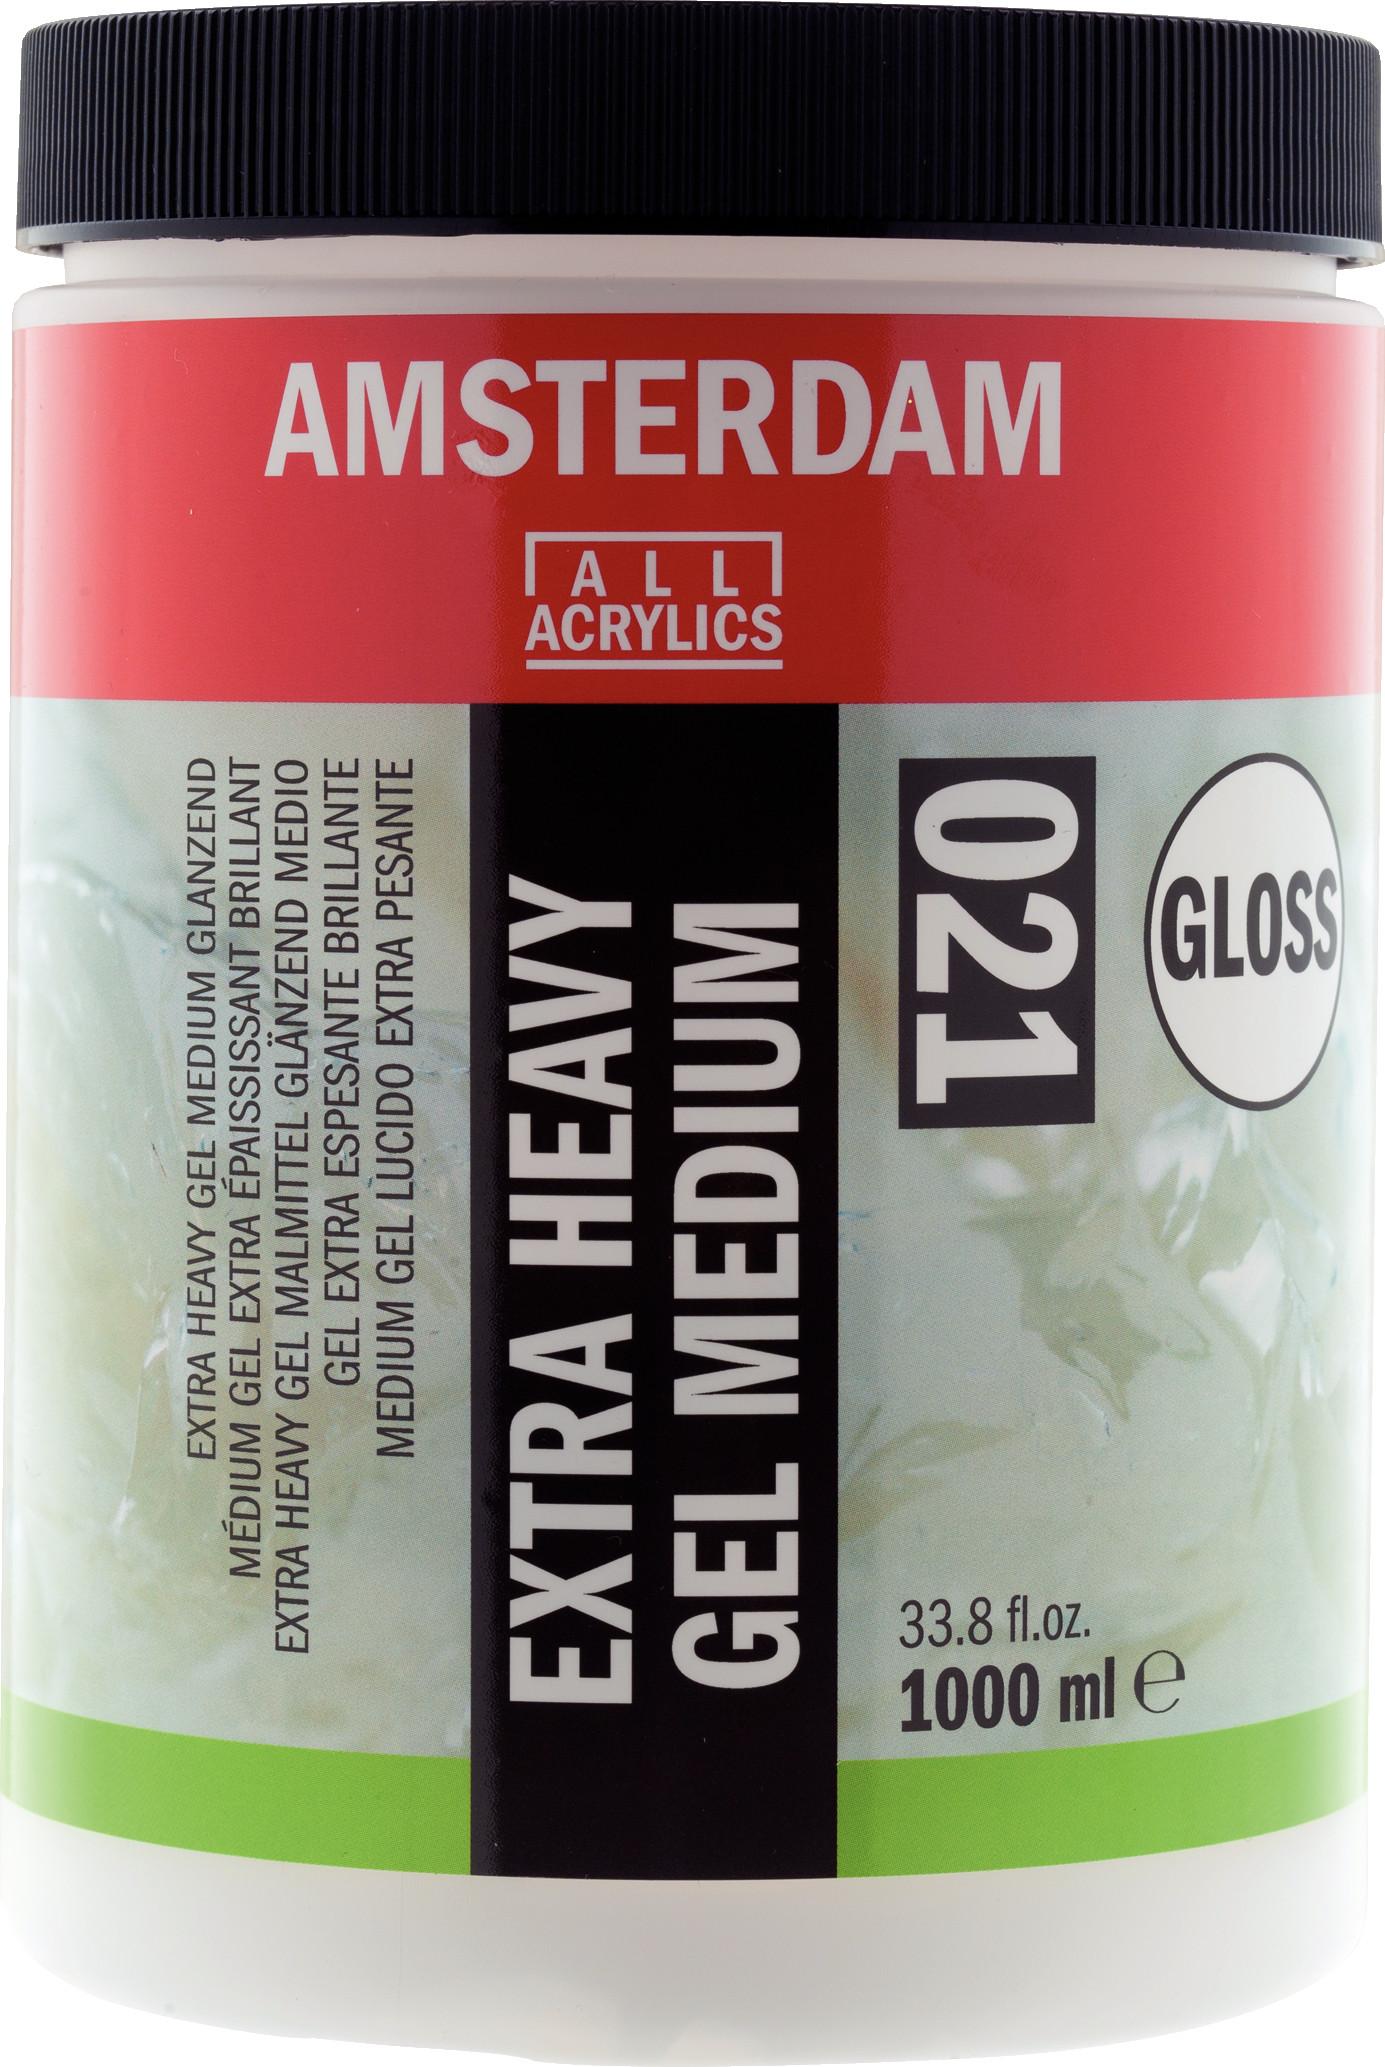 Amsterdam Extra Heavy Gel Medium Gloss Jar 1000 ml